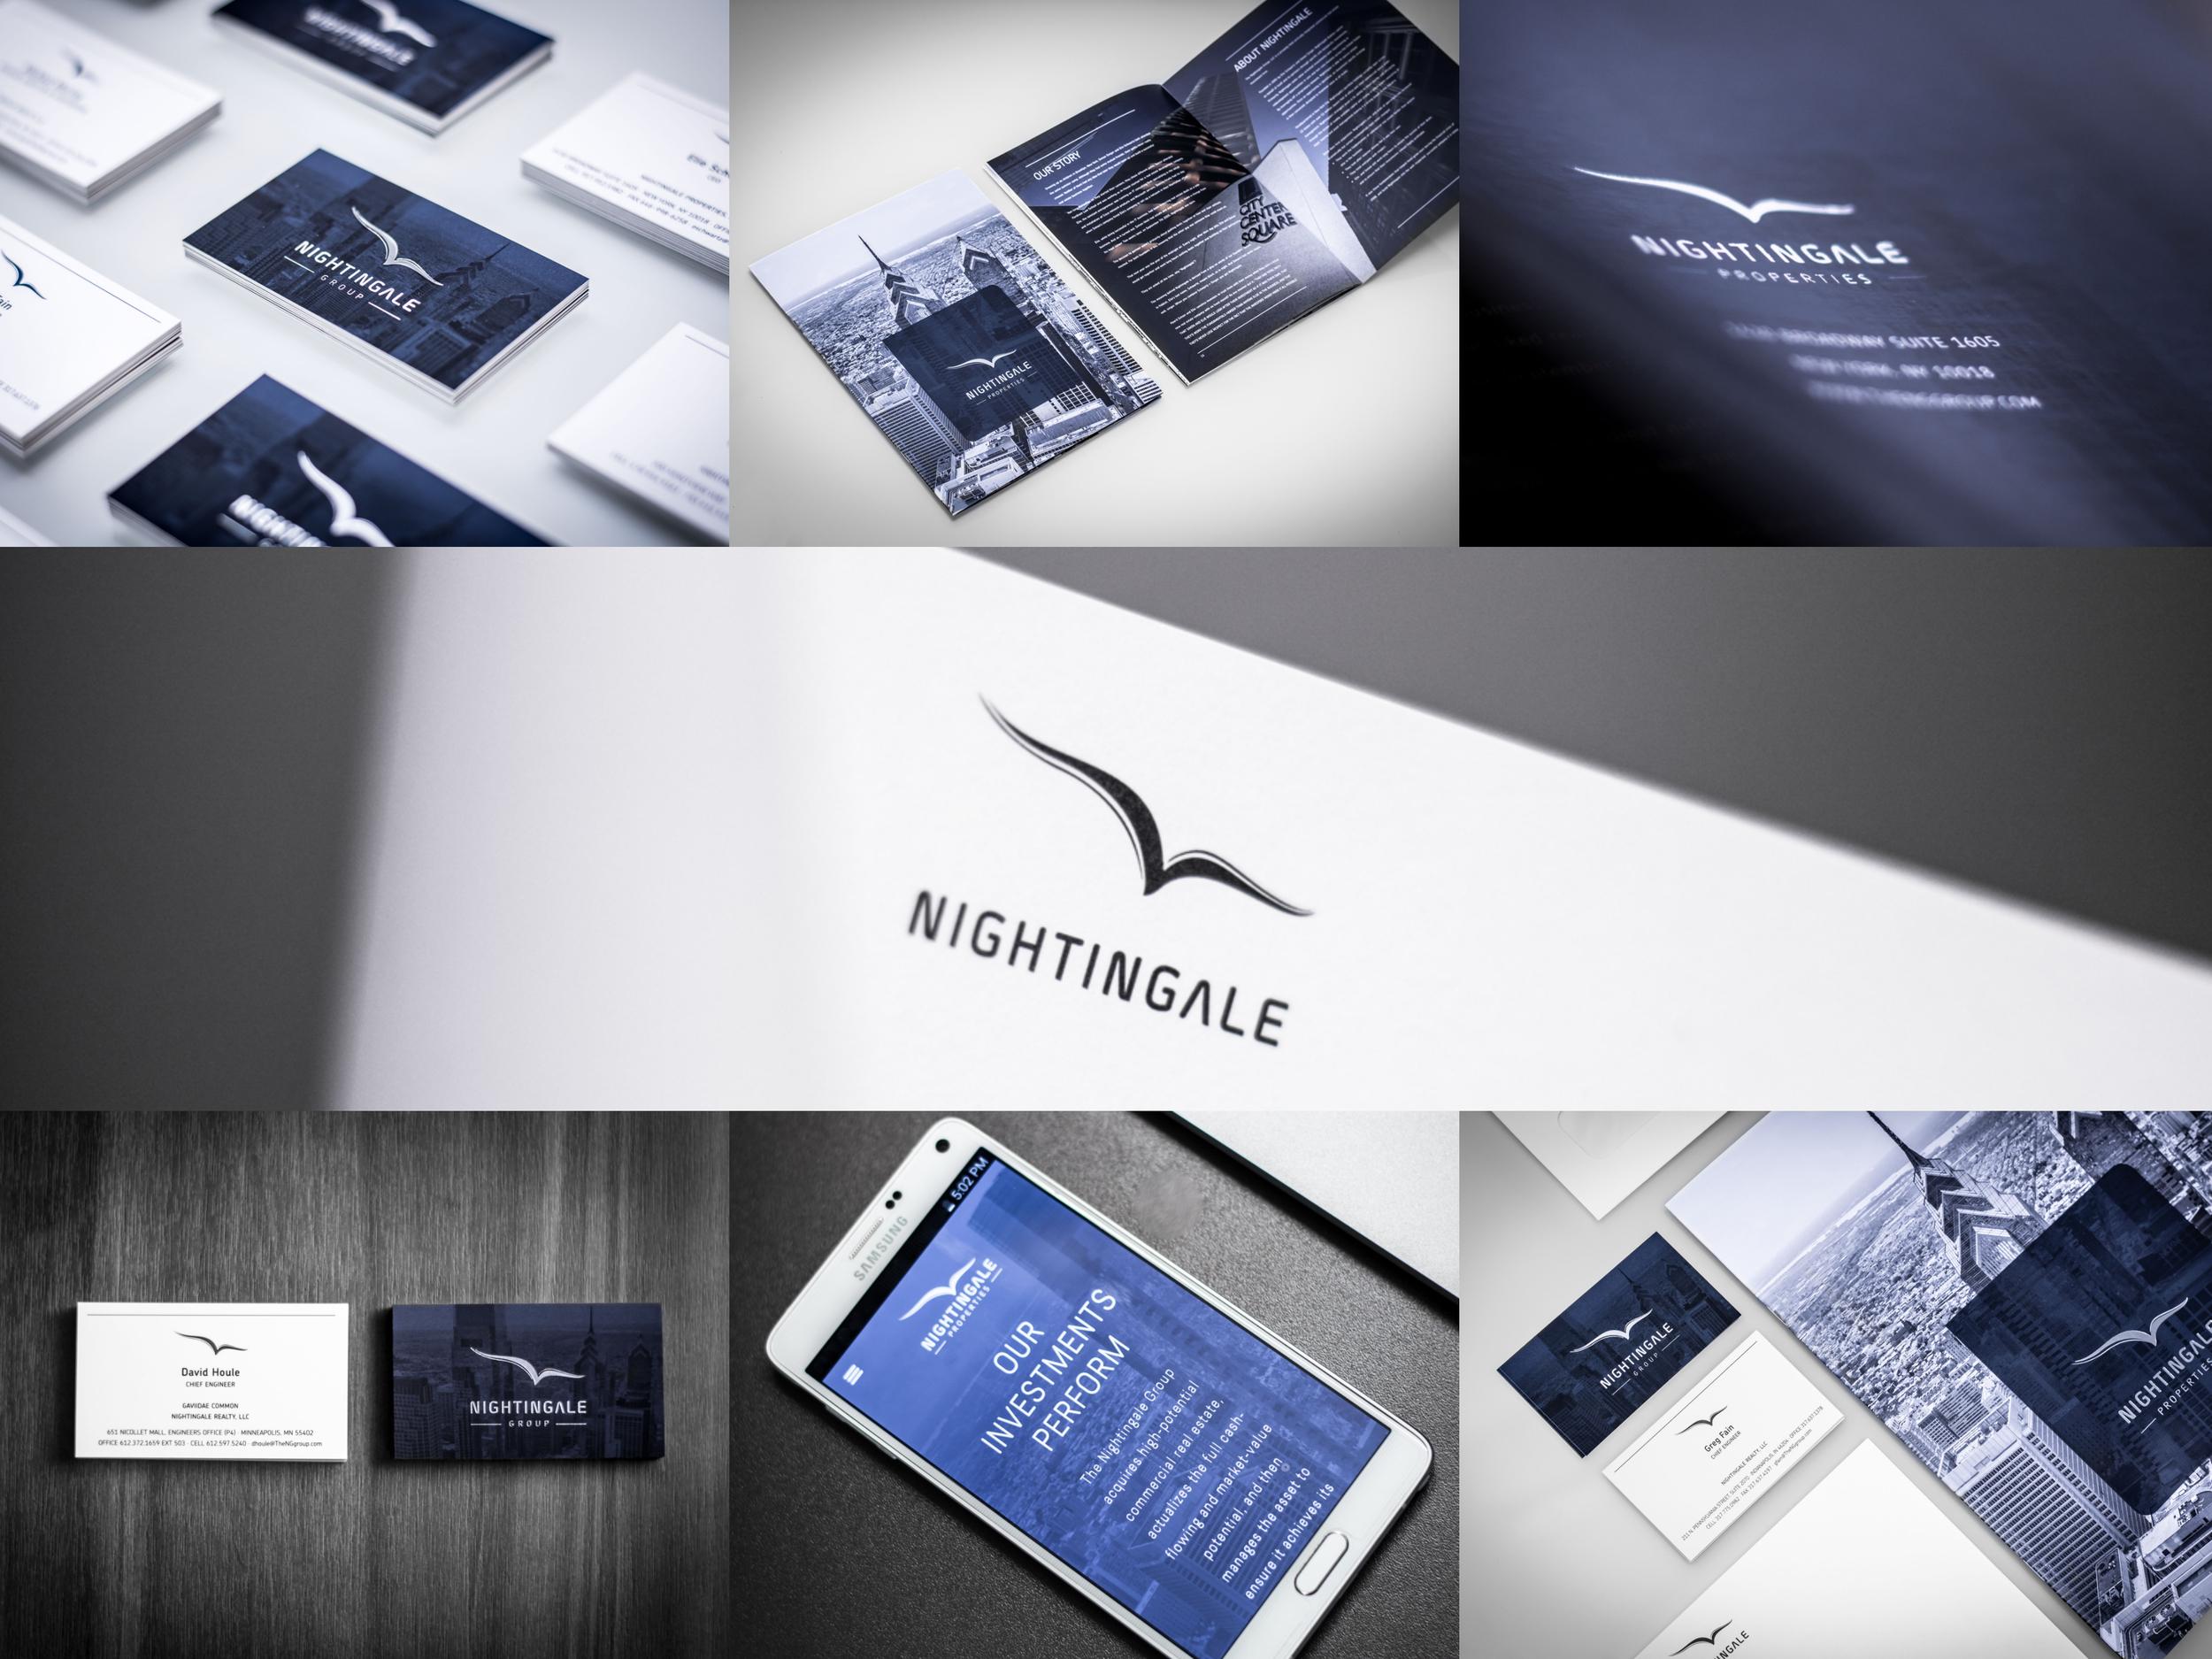 Nightingale Brand Collage.jpeg